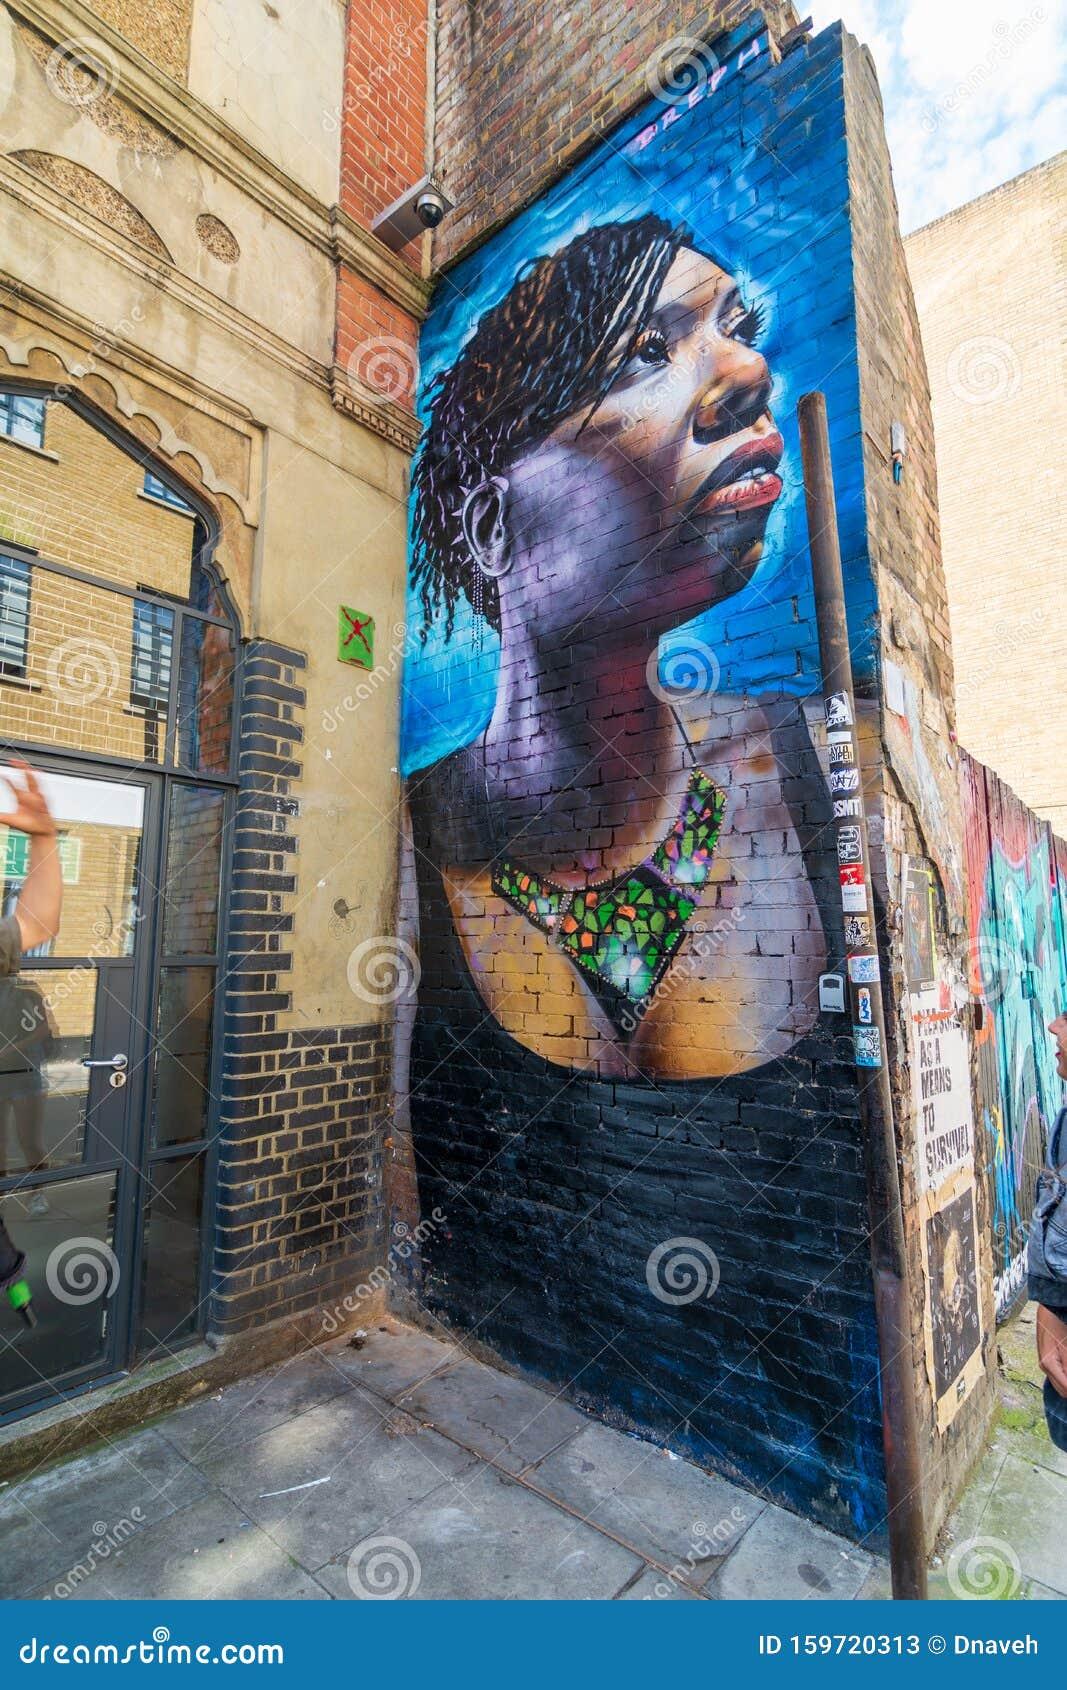 Shoreditch Graffiti: Street Art And Graffiti At The Shoreditch Quarter Of